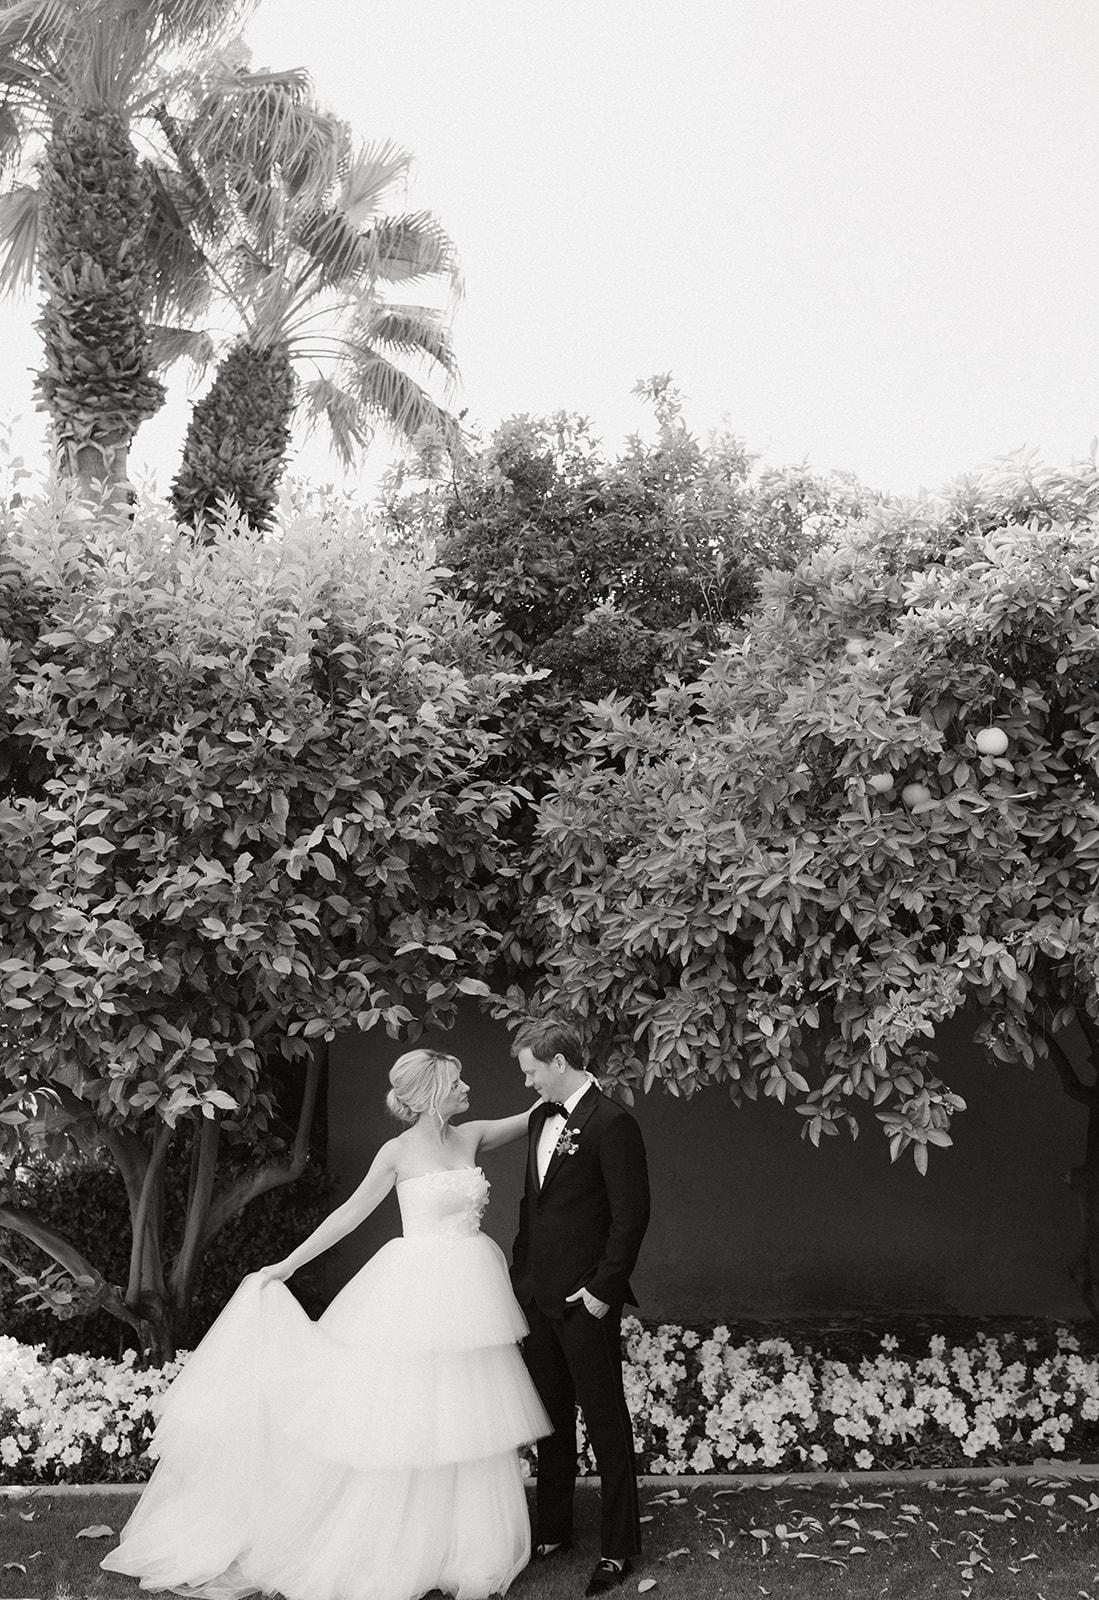 KL_WEDDING_0164.jpg